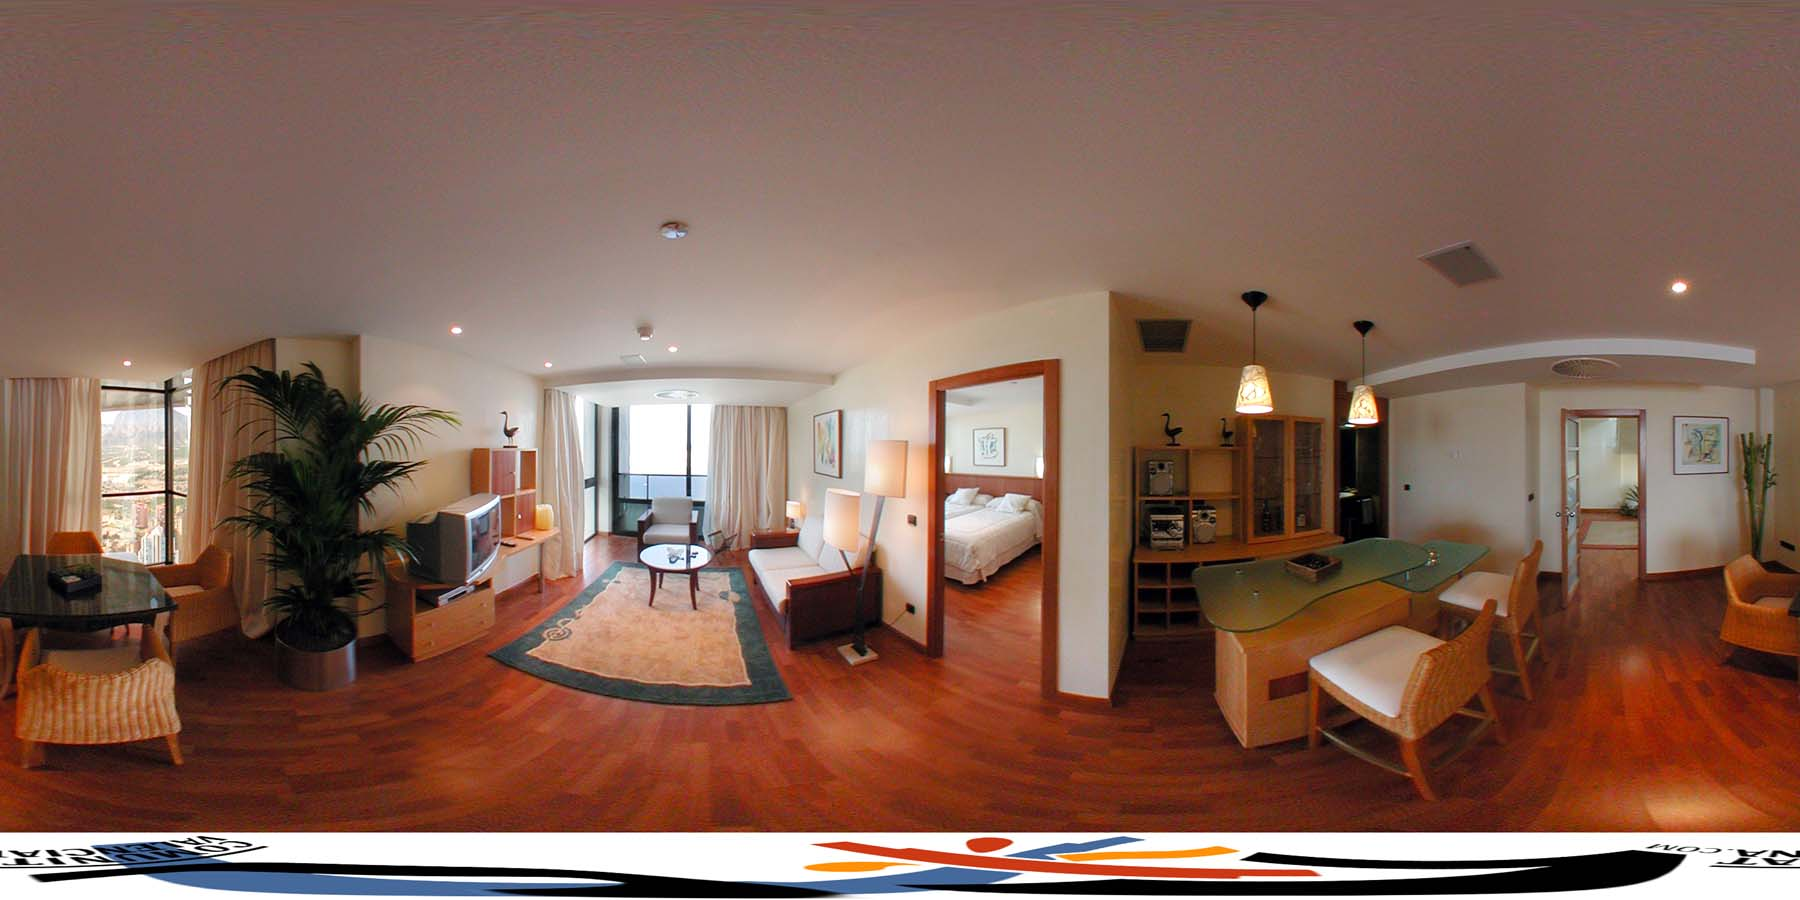 Gran Hotel Bali Comunitat Valenciana